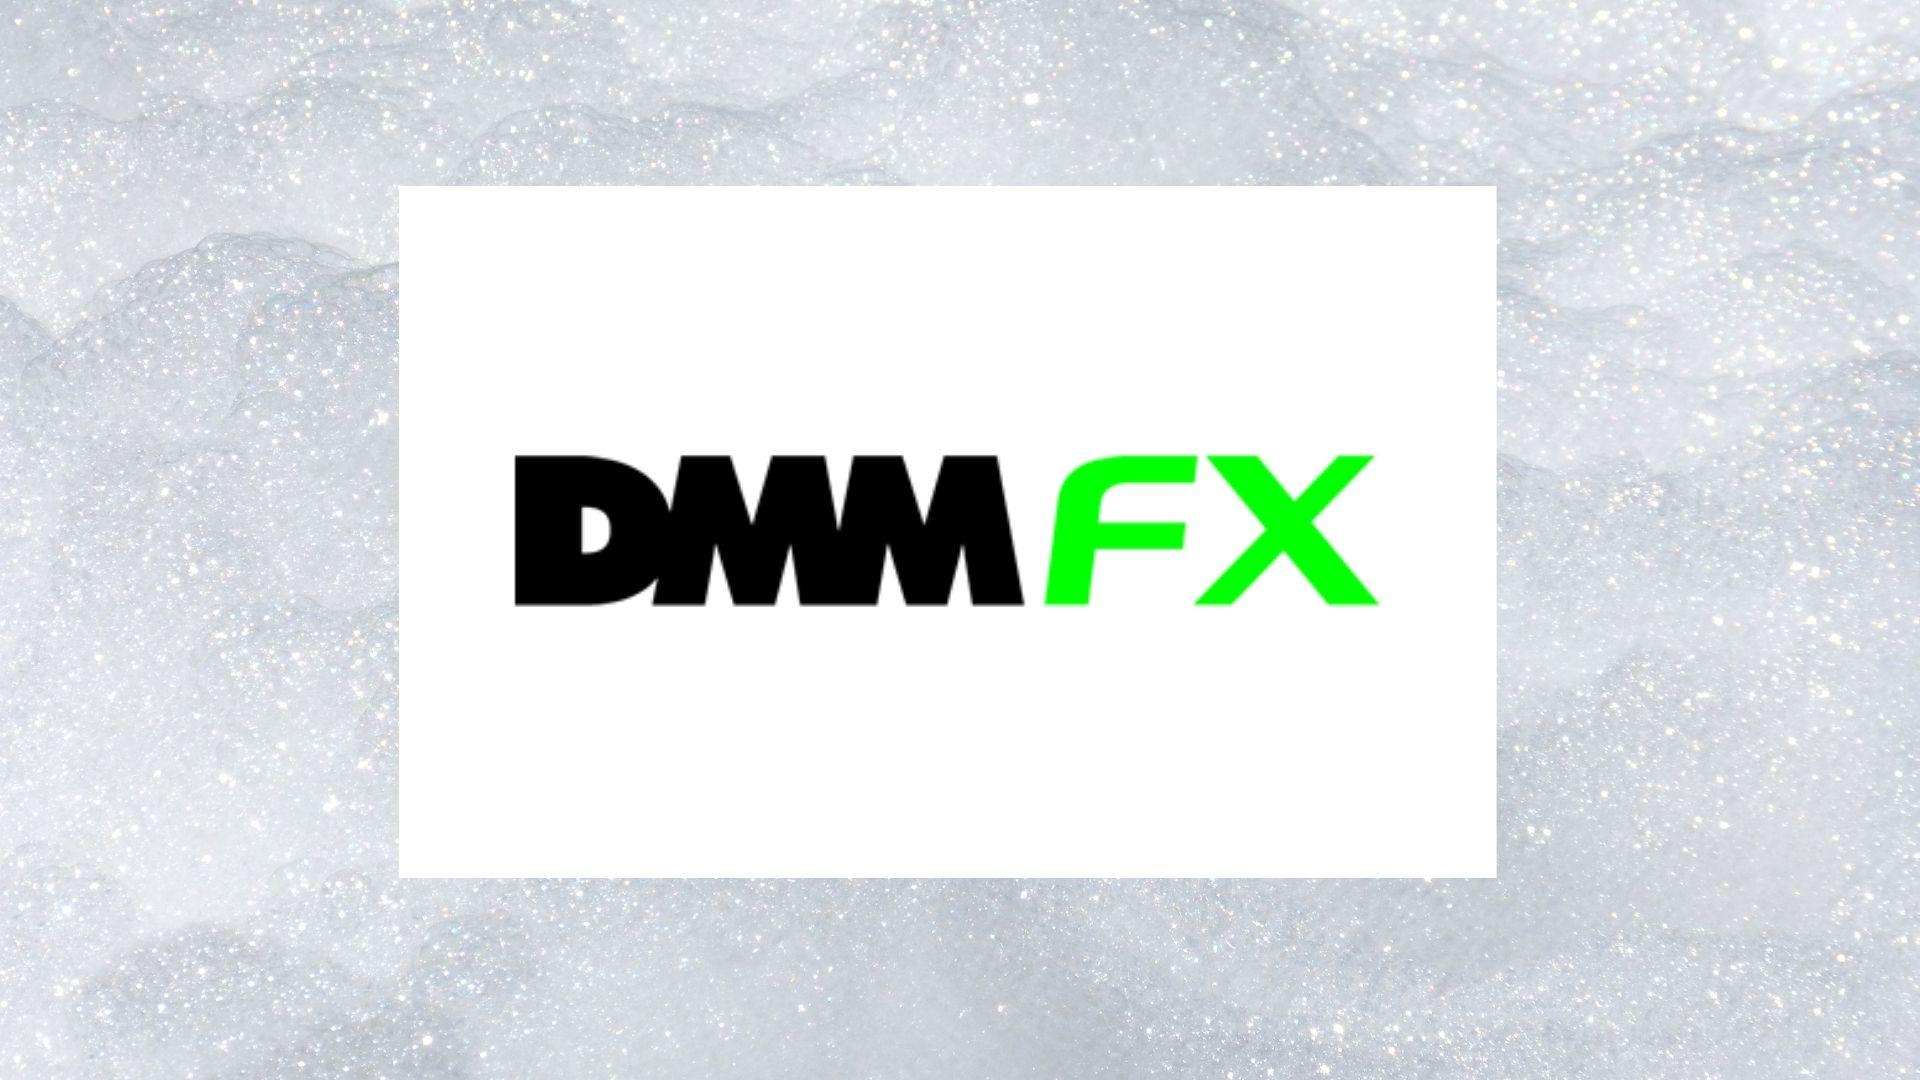 DMM FXの気になる口コミ評判は?特徴や口座開設方法など詳しく解説